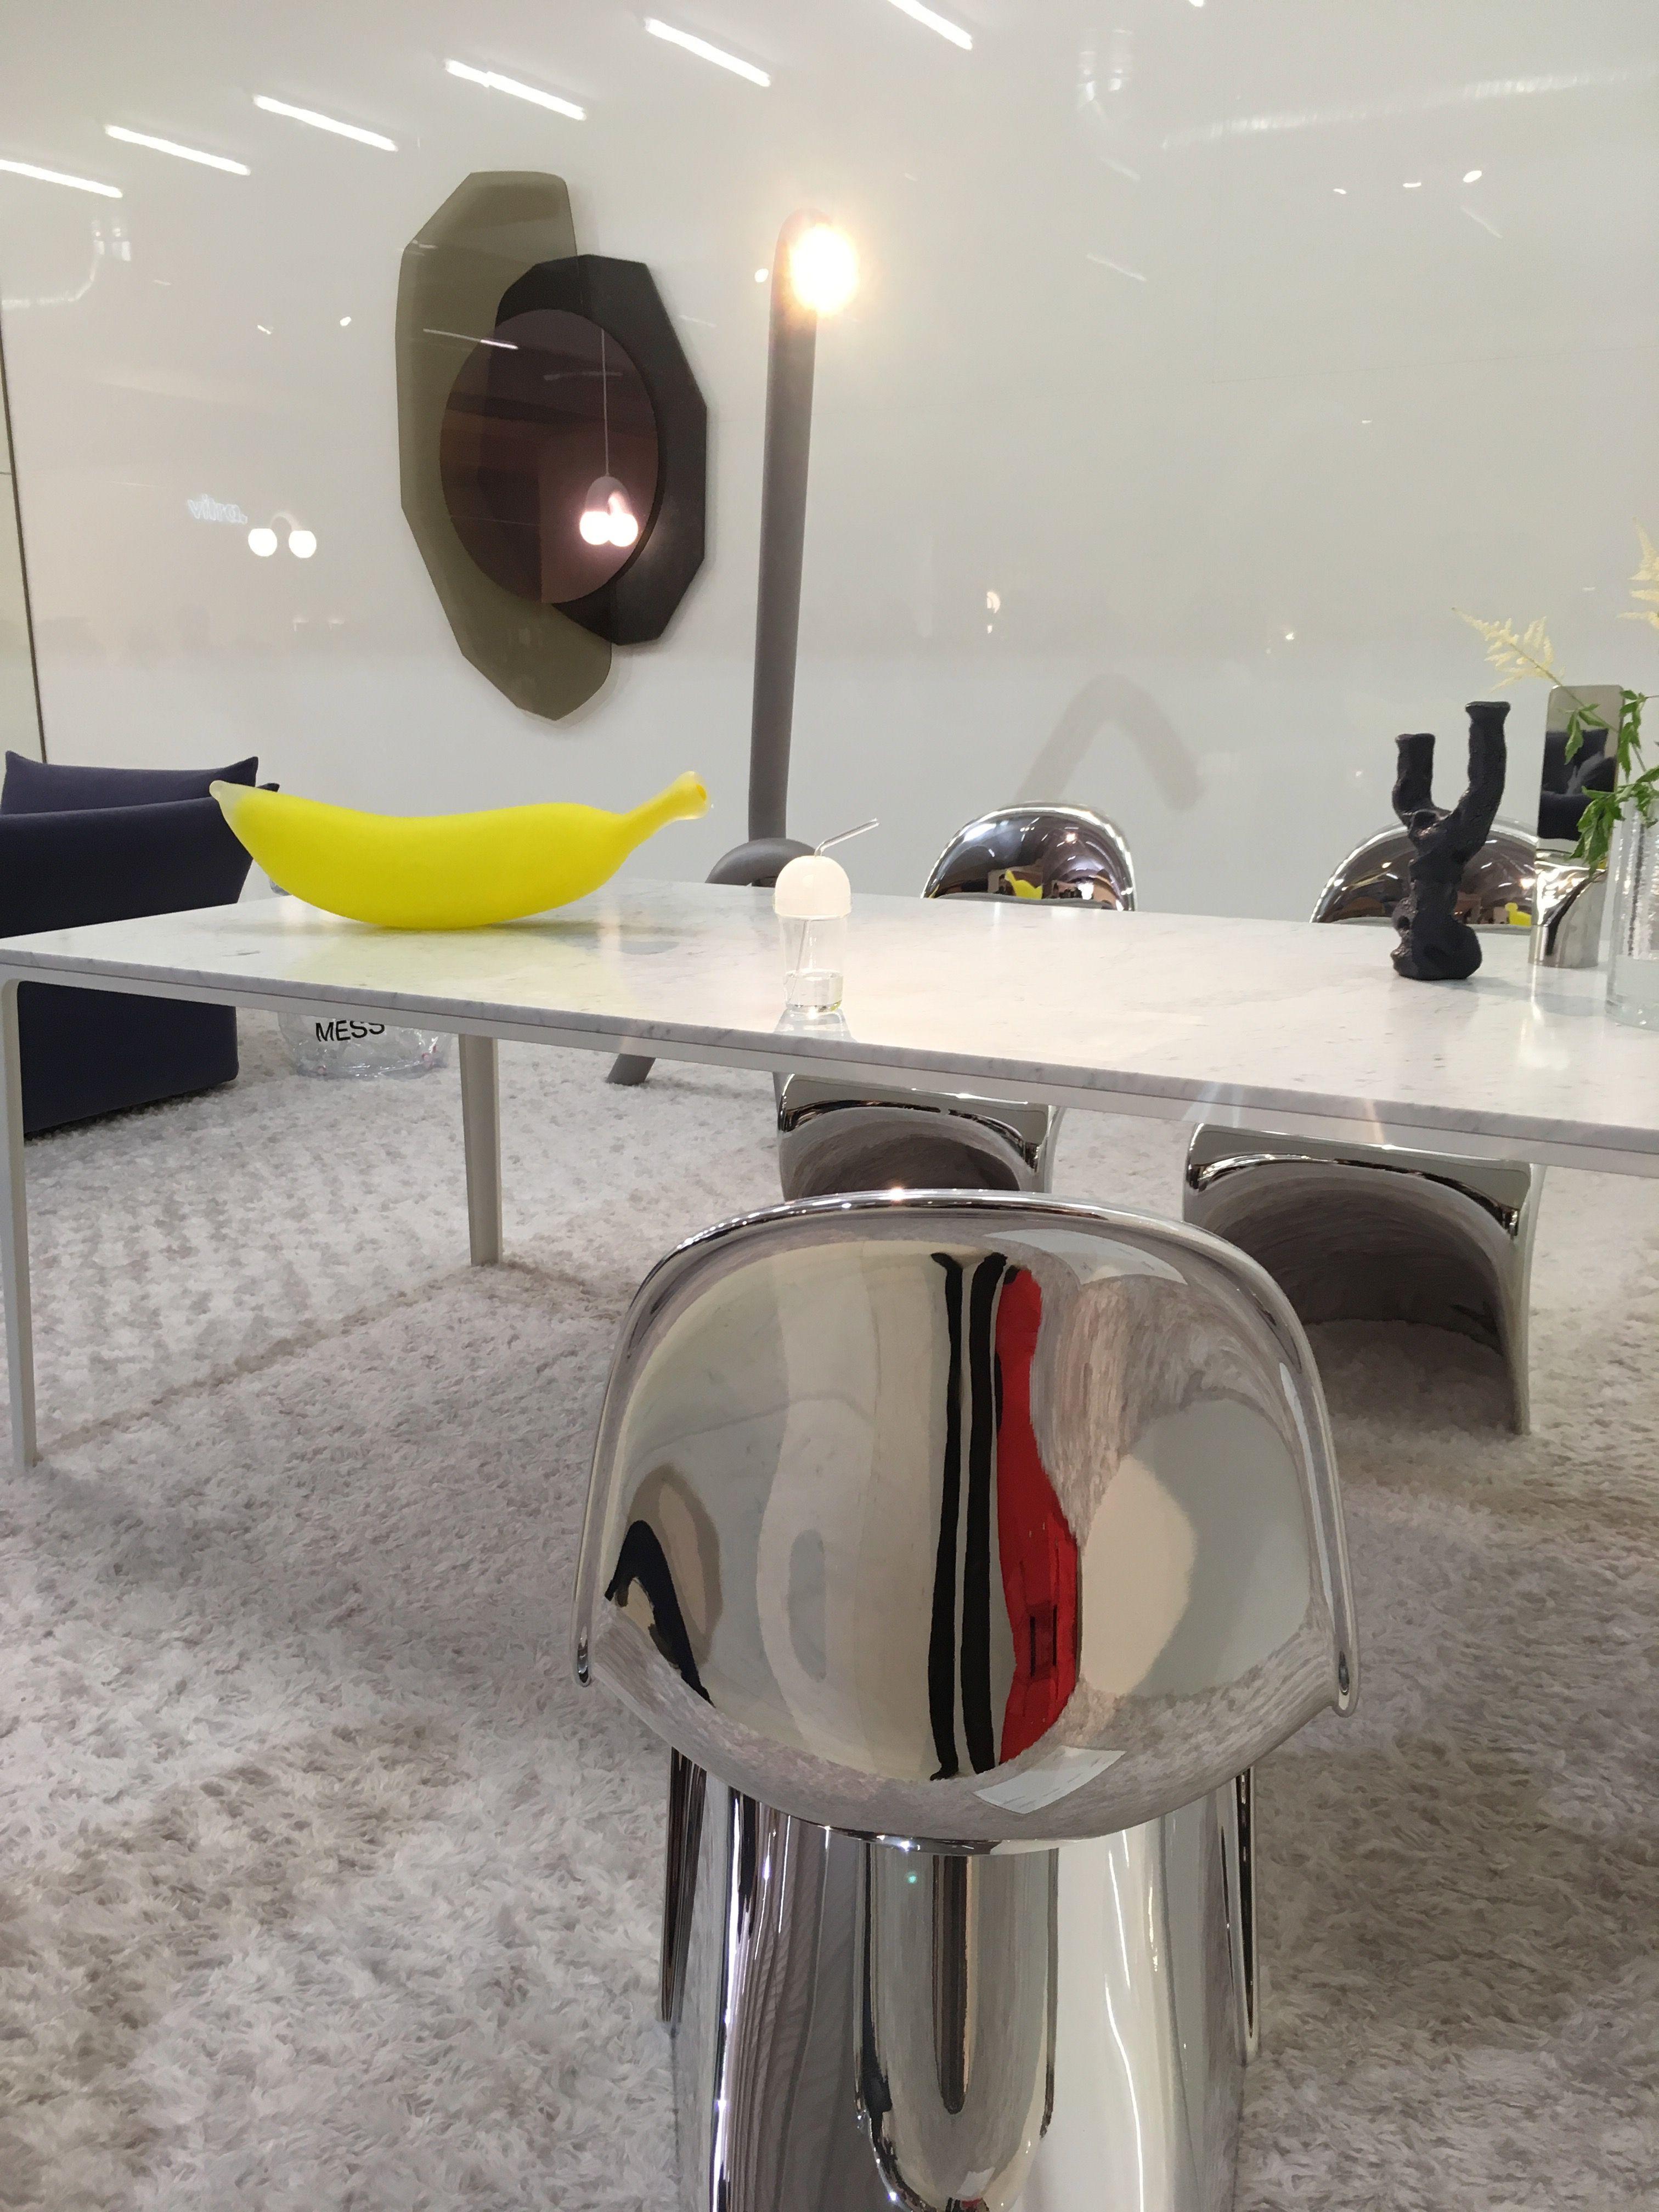 Panton chrome chair designed by verner panton for vitra